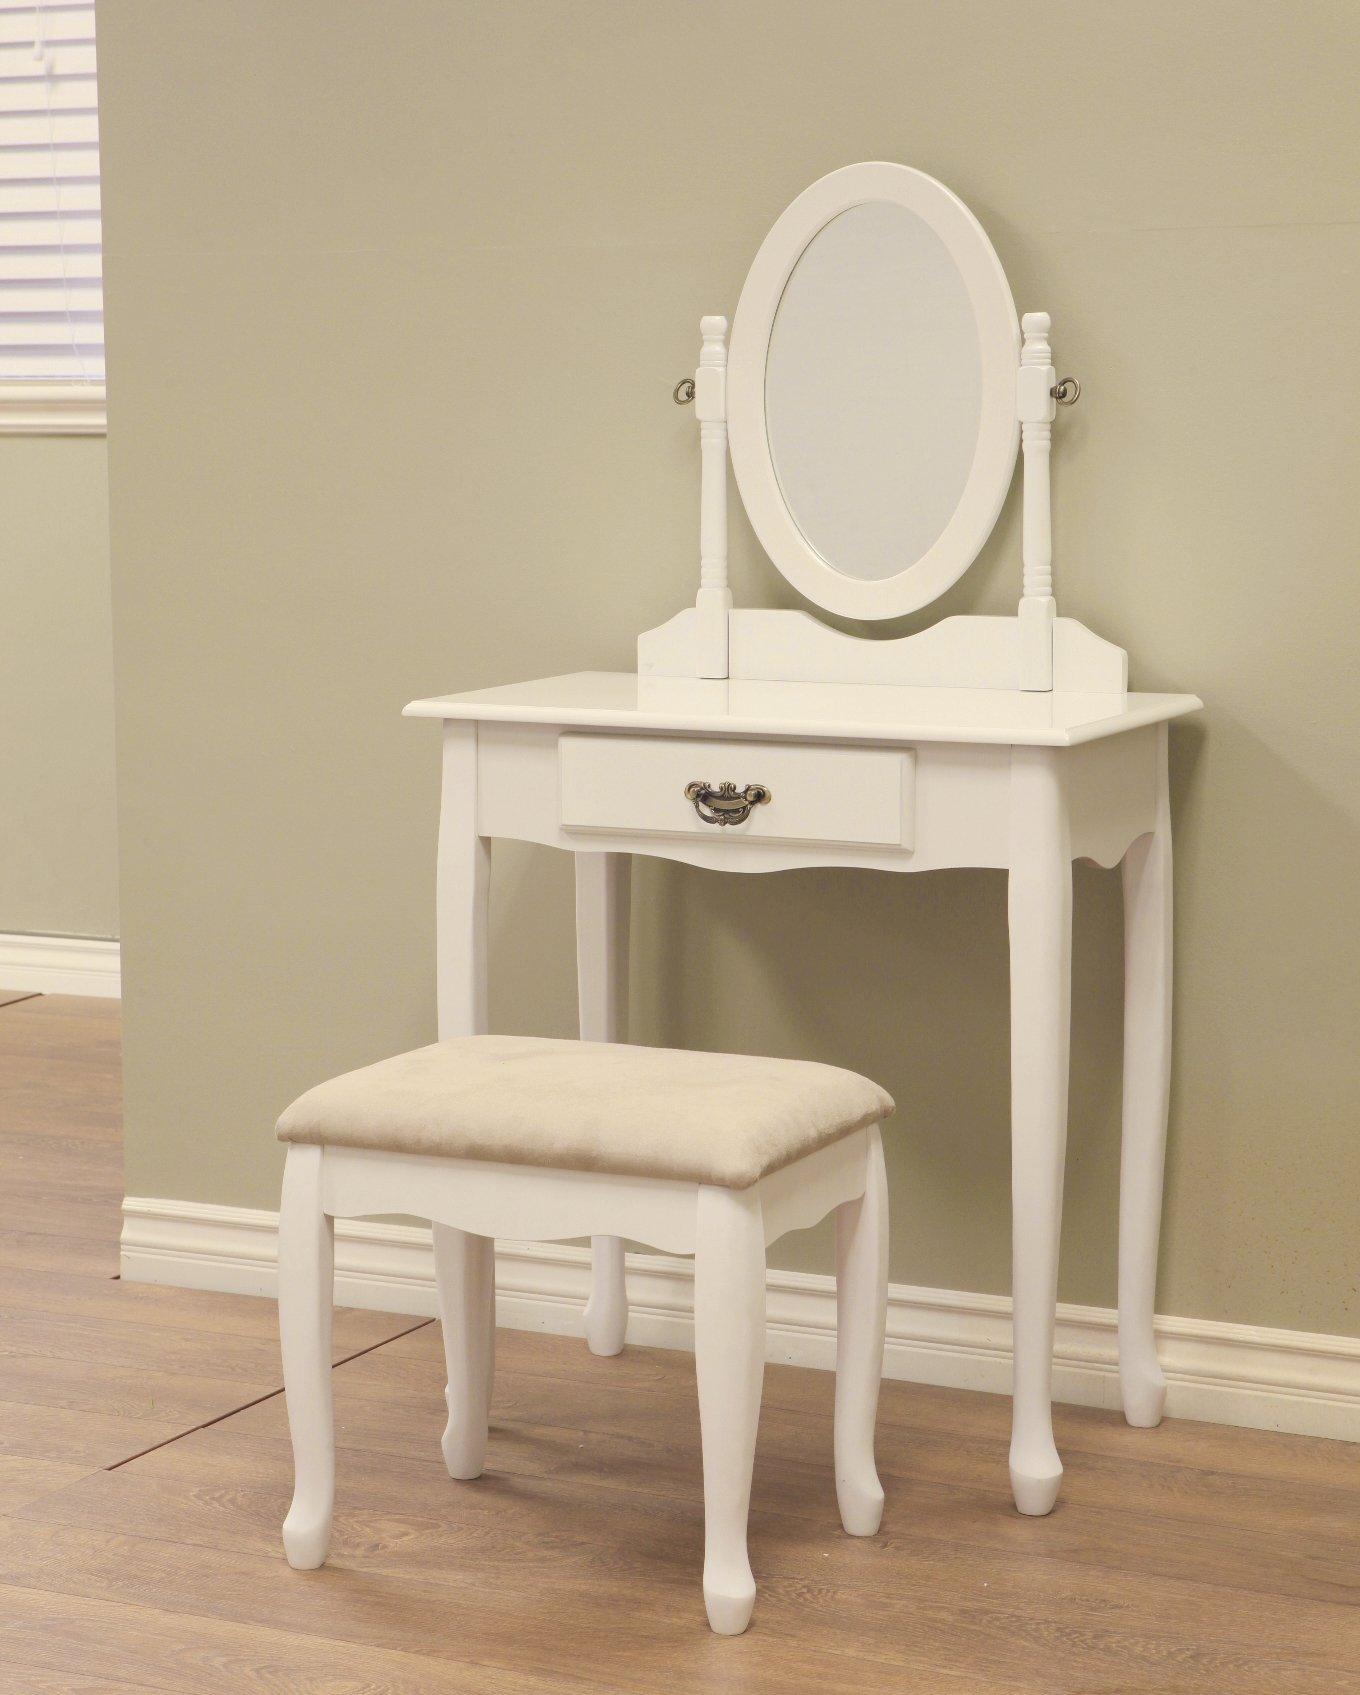 Frenchi Home Furnishing 3-Piece Vanity Set, Ivory